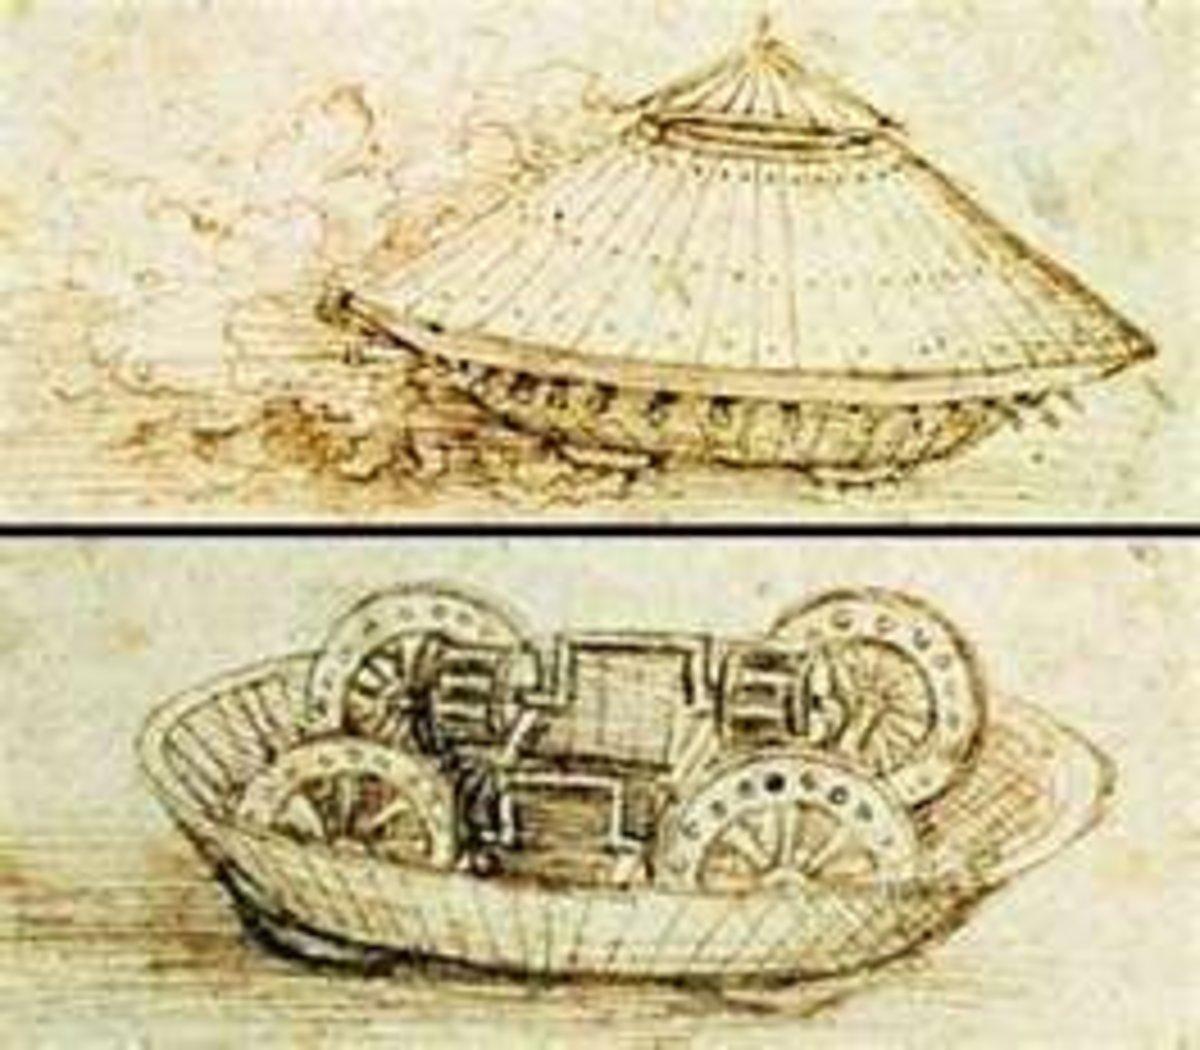 Leonardo's Design for an Armored Tank